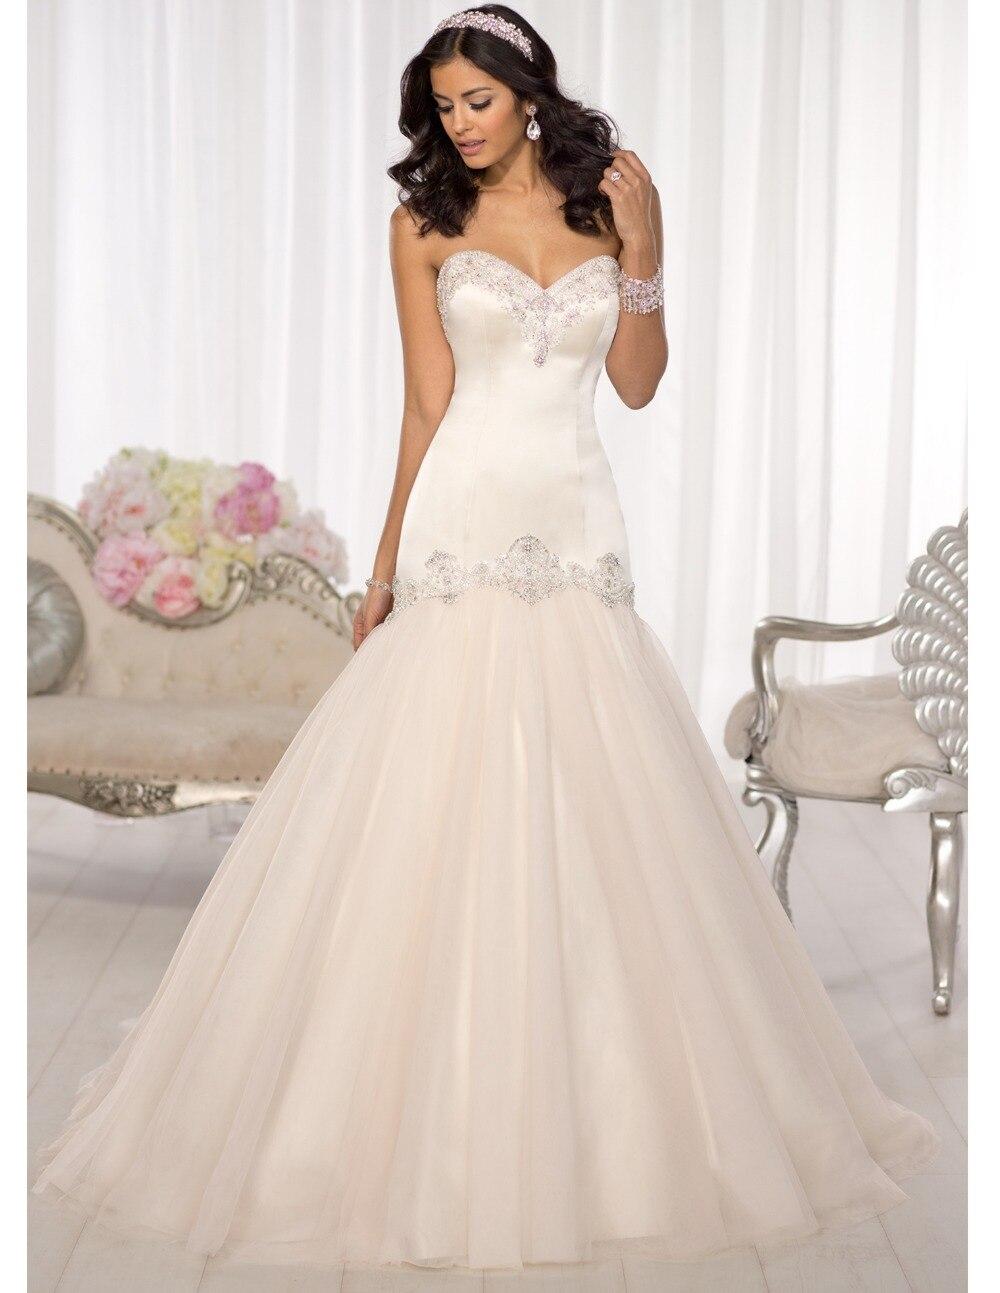 popular crystal wedding dresses buy cheap crystal wedding dresses lots from china crystal. Black Bedroom Furniture Sets. Home Design Ideas